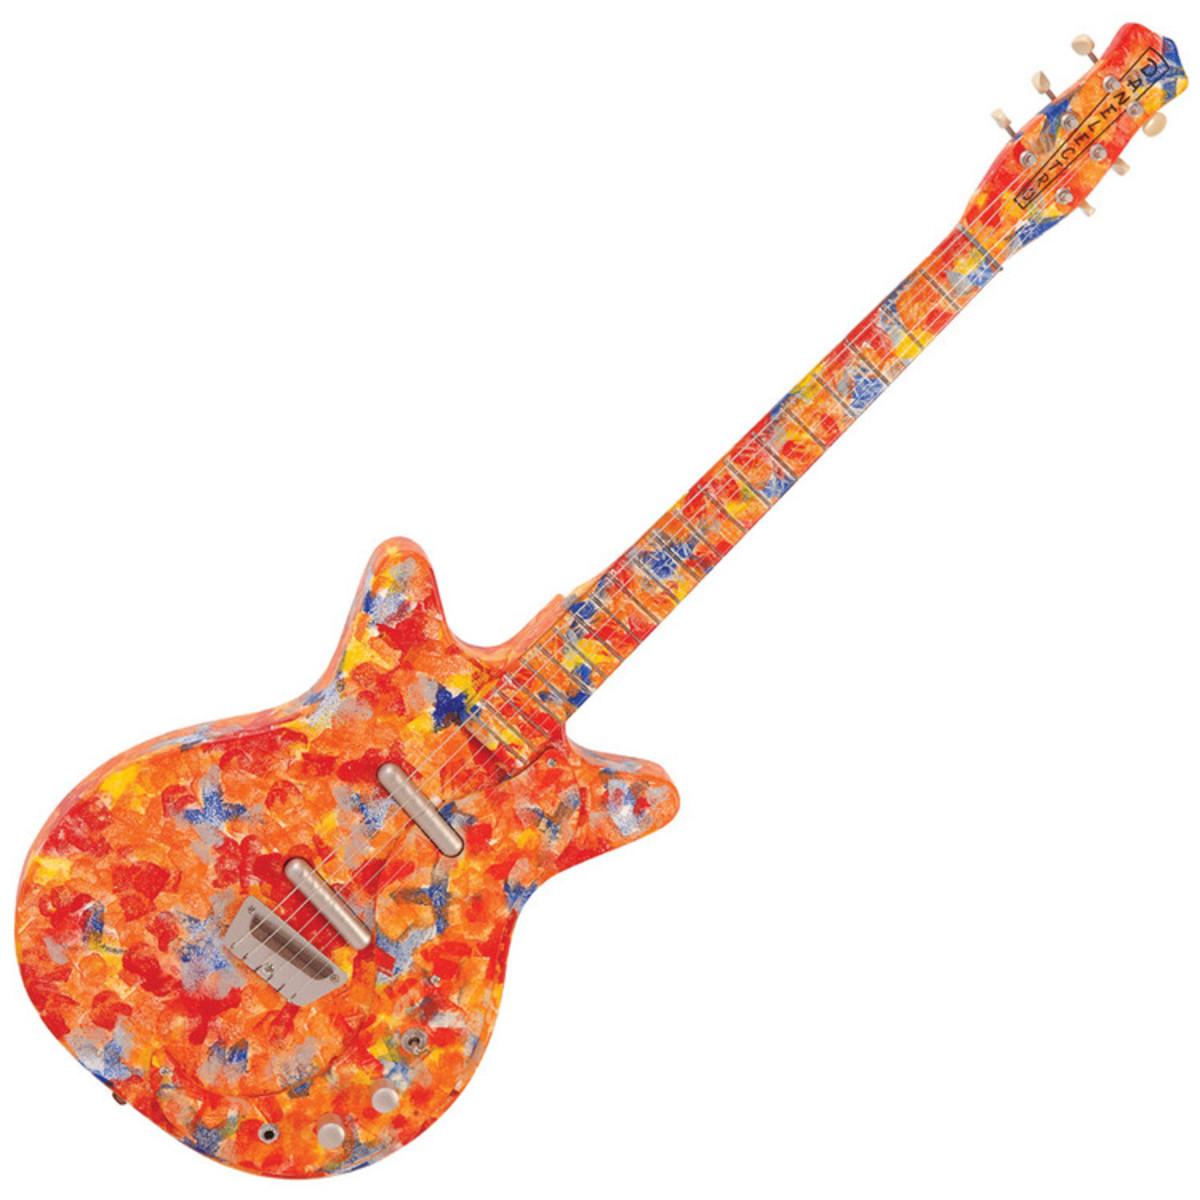 DISC Danelectro 59, Original Spec Guitar, Psychedelic